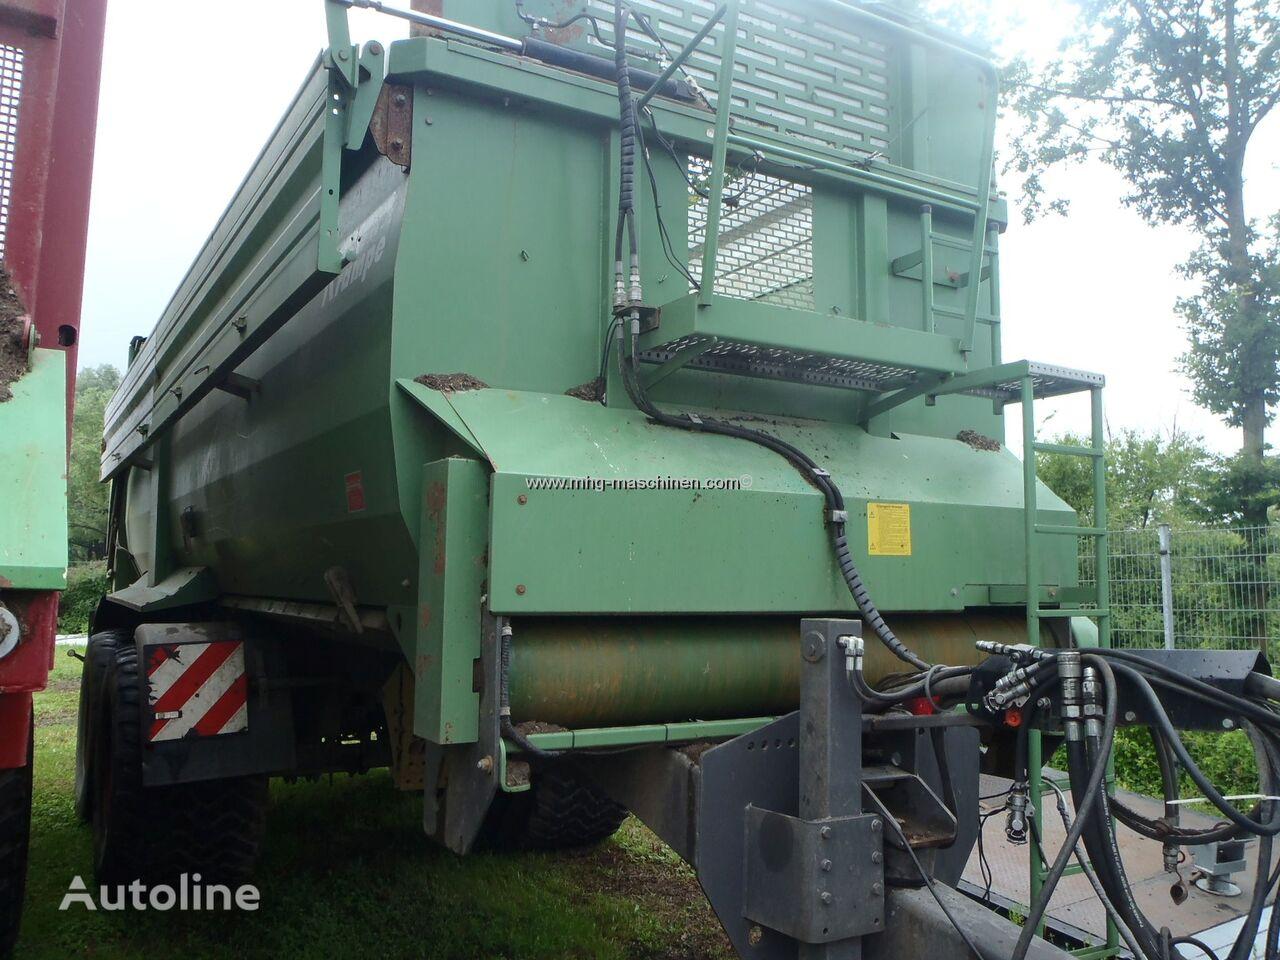 Krampe Bandit 750 grain trailer